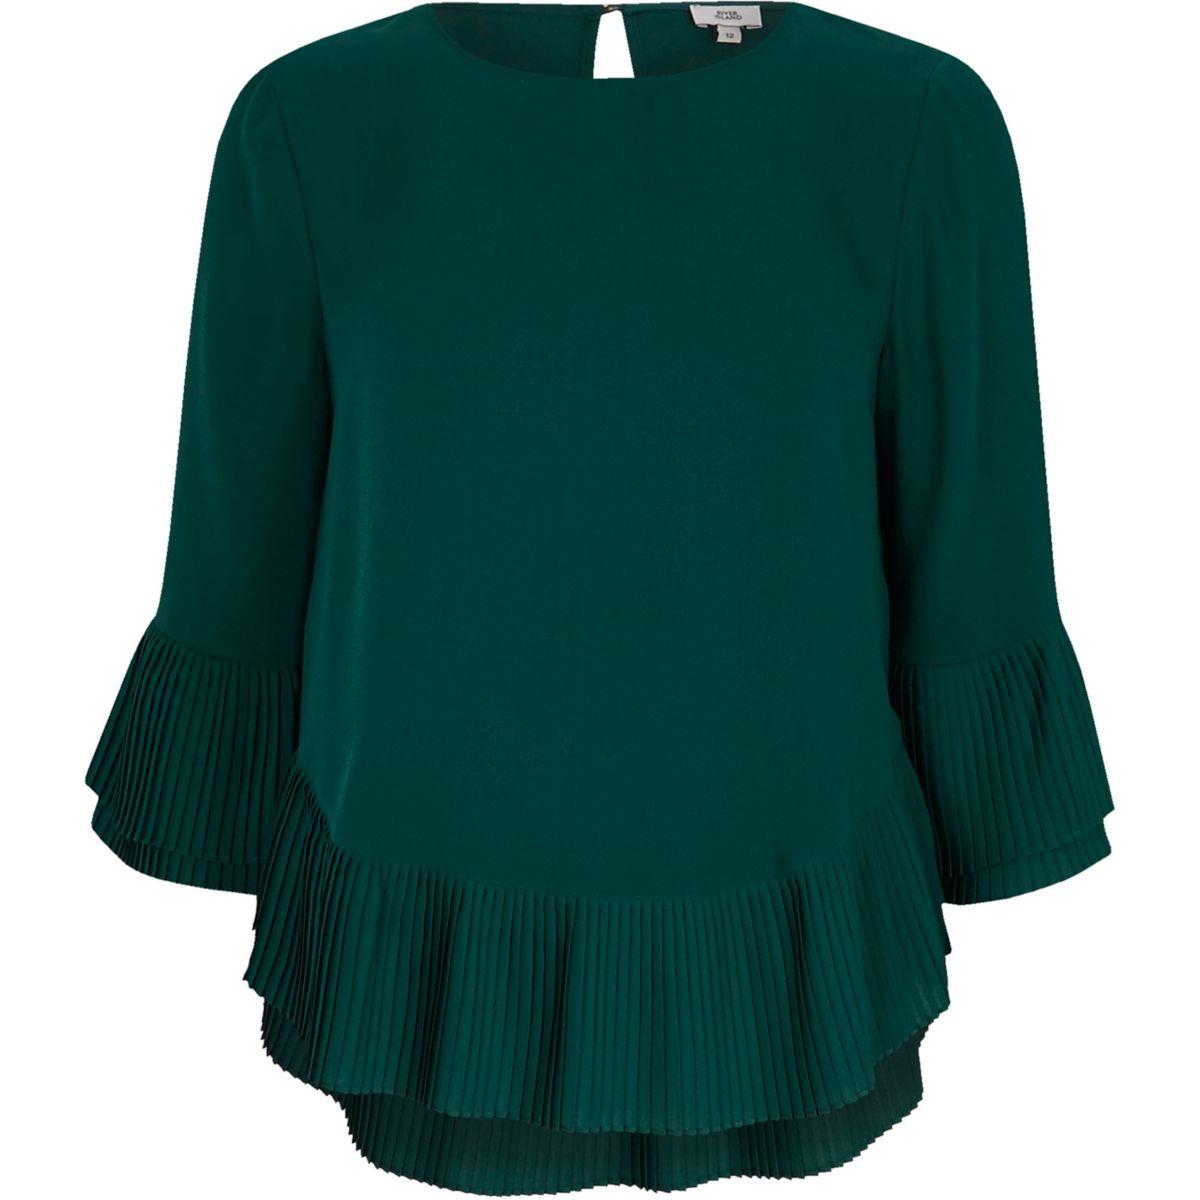 Green pleated hem top